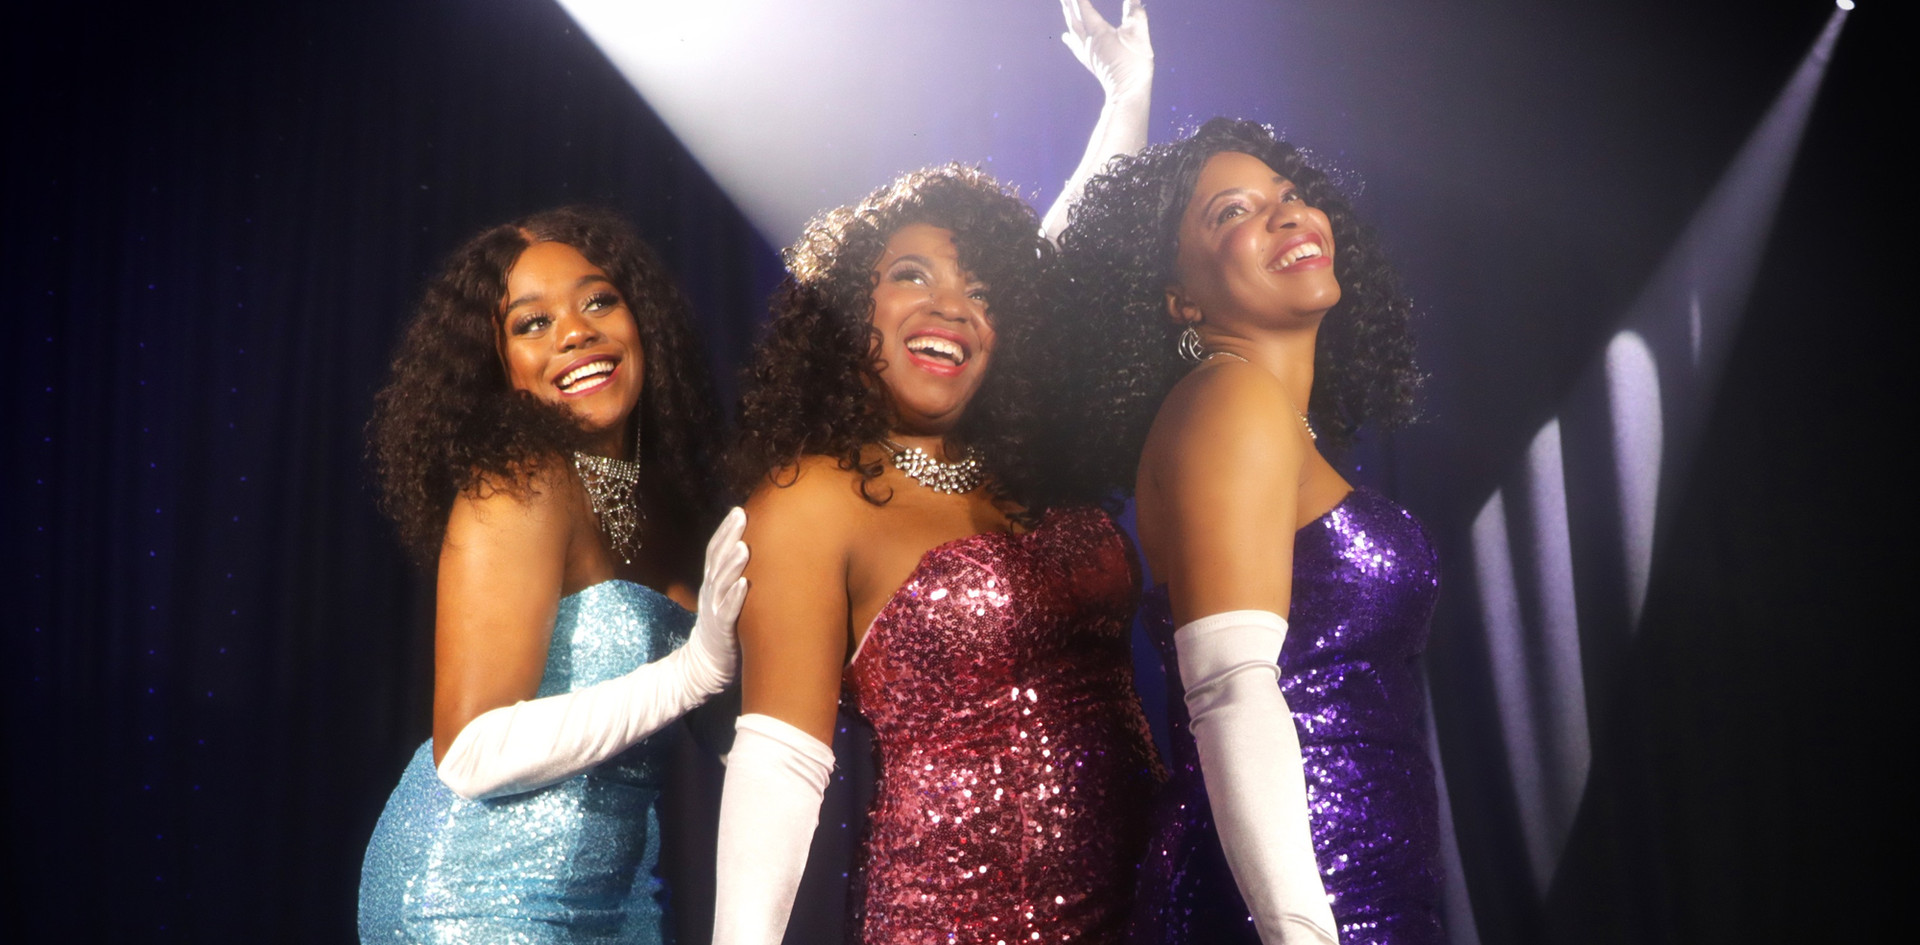 Tashara Forrest with Sleeke Motown Glamour